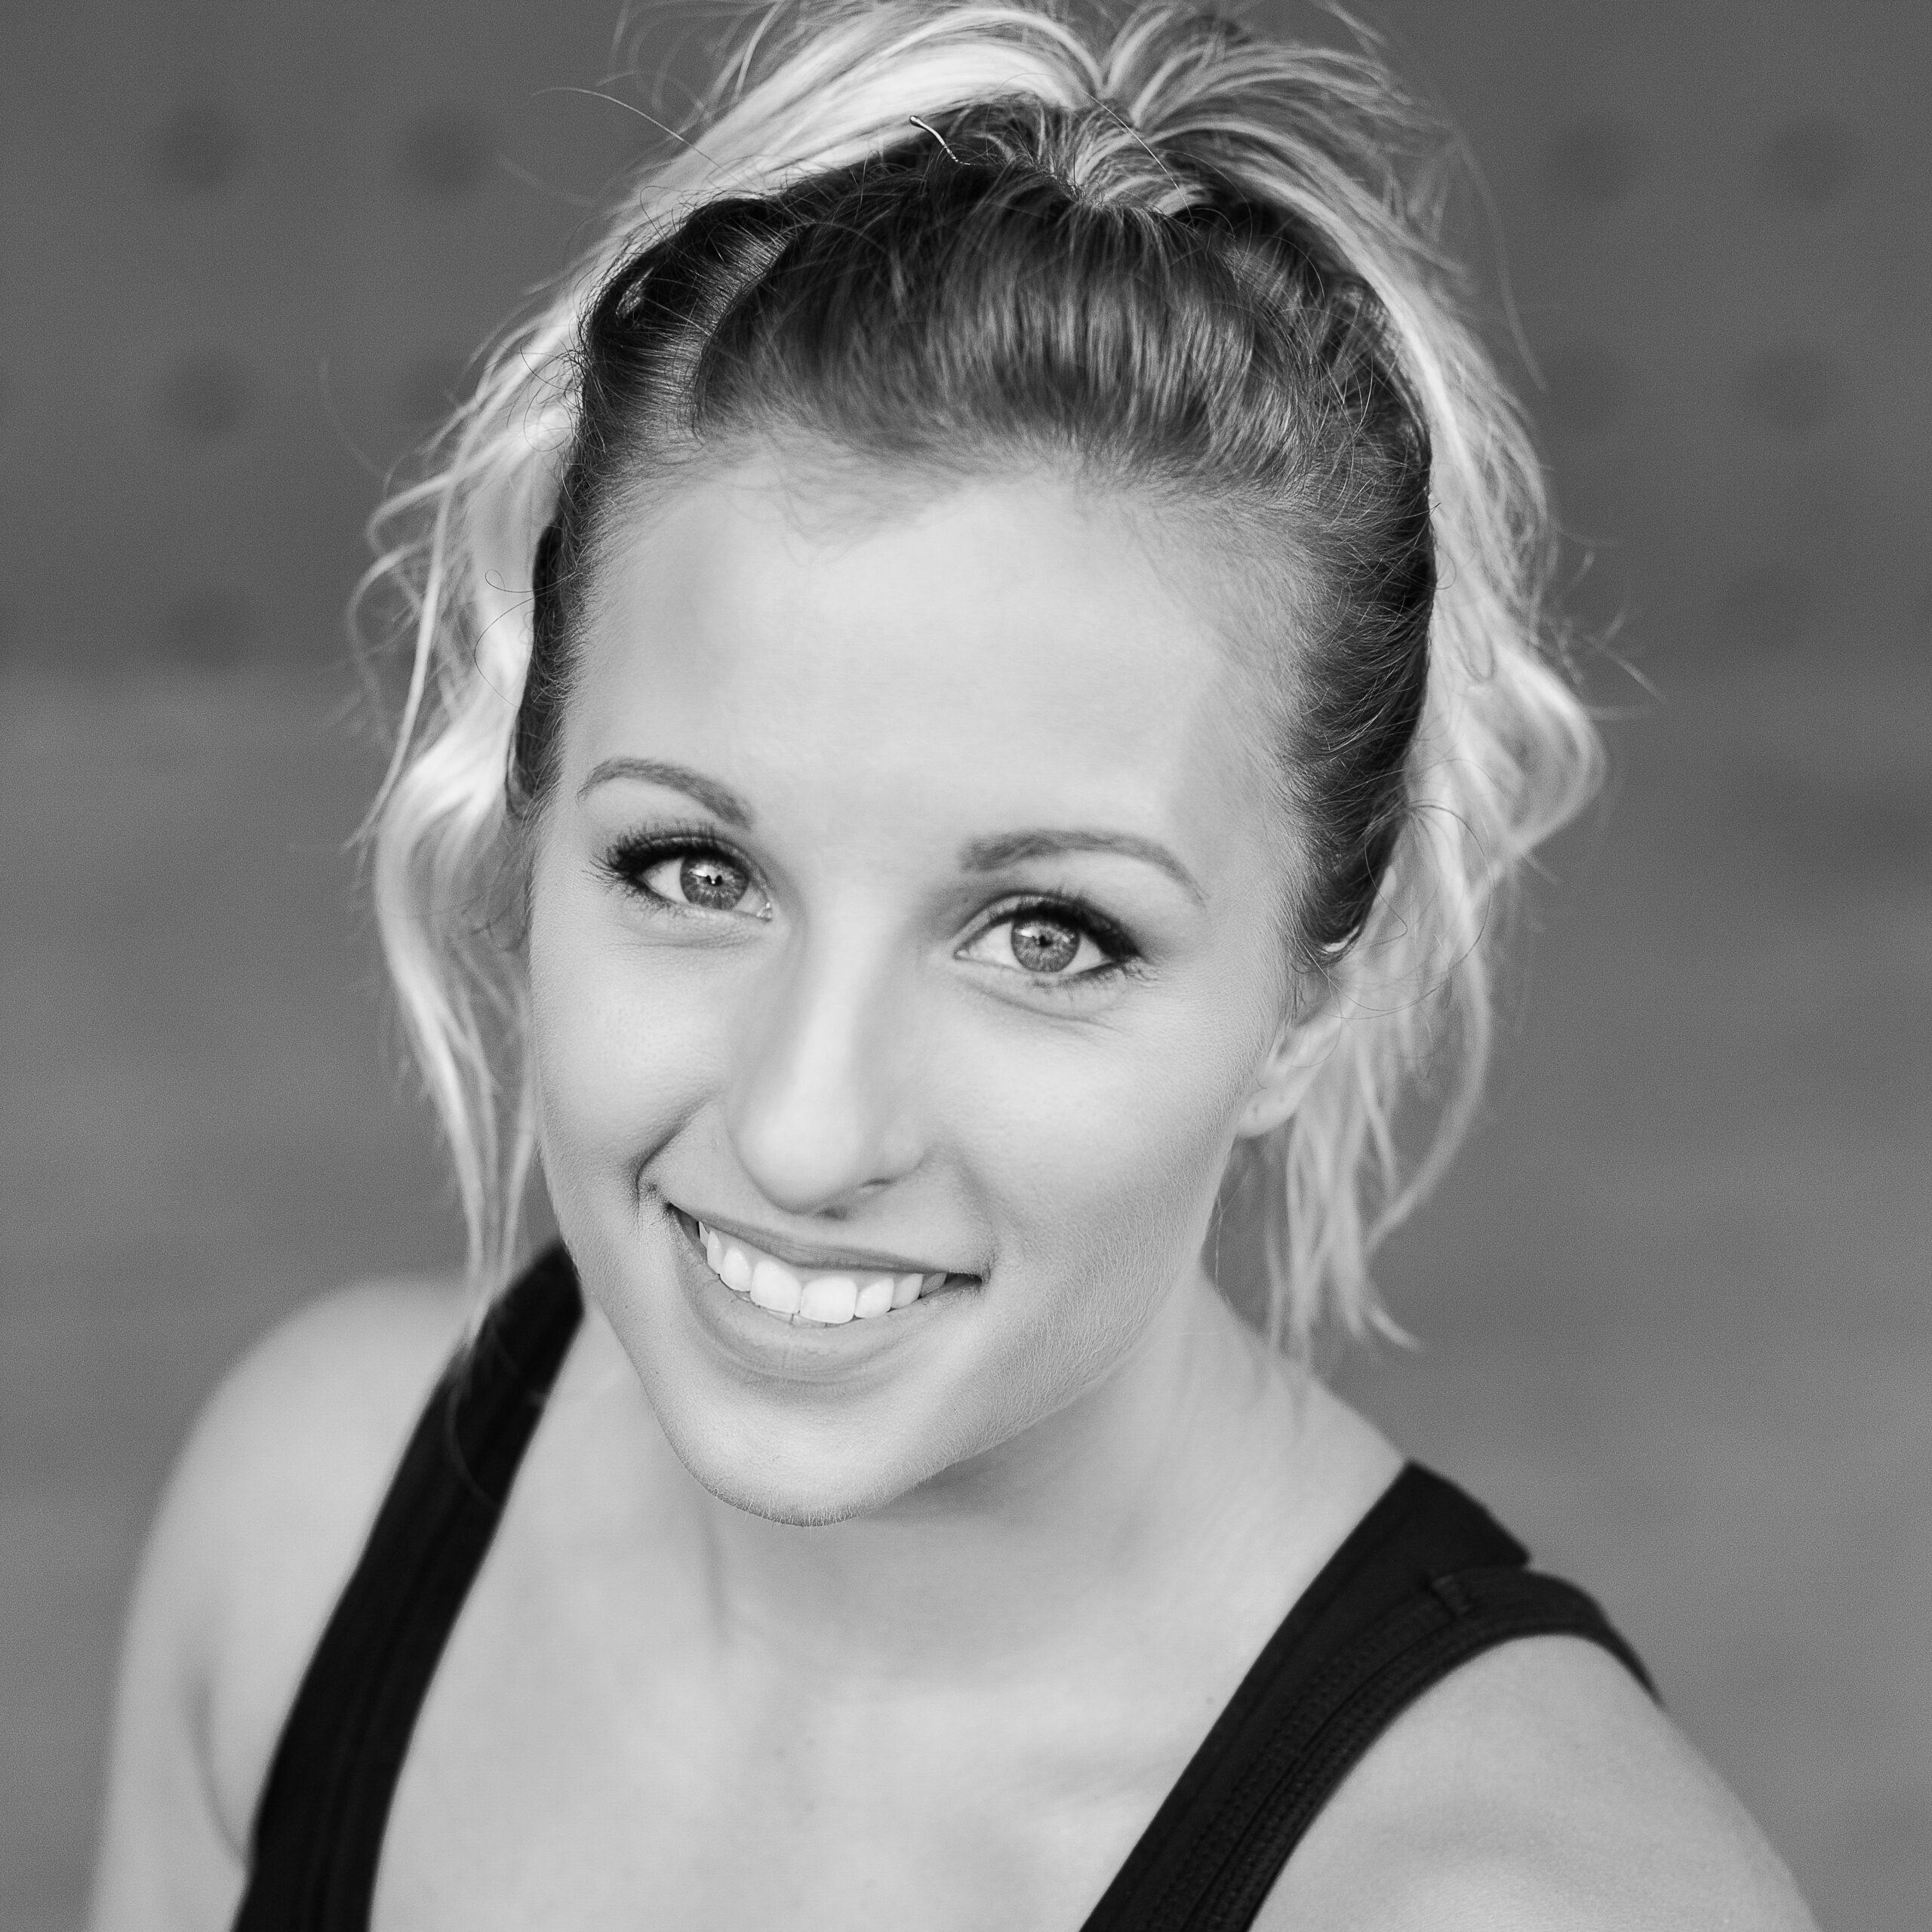 Melissa Jeanette